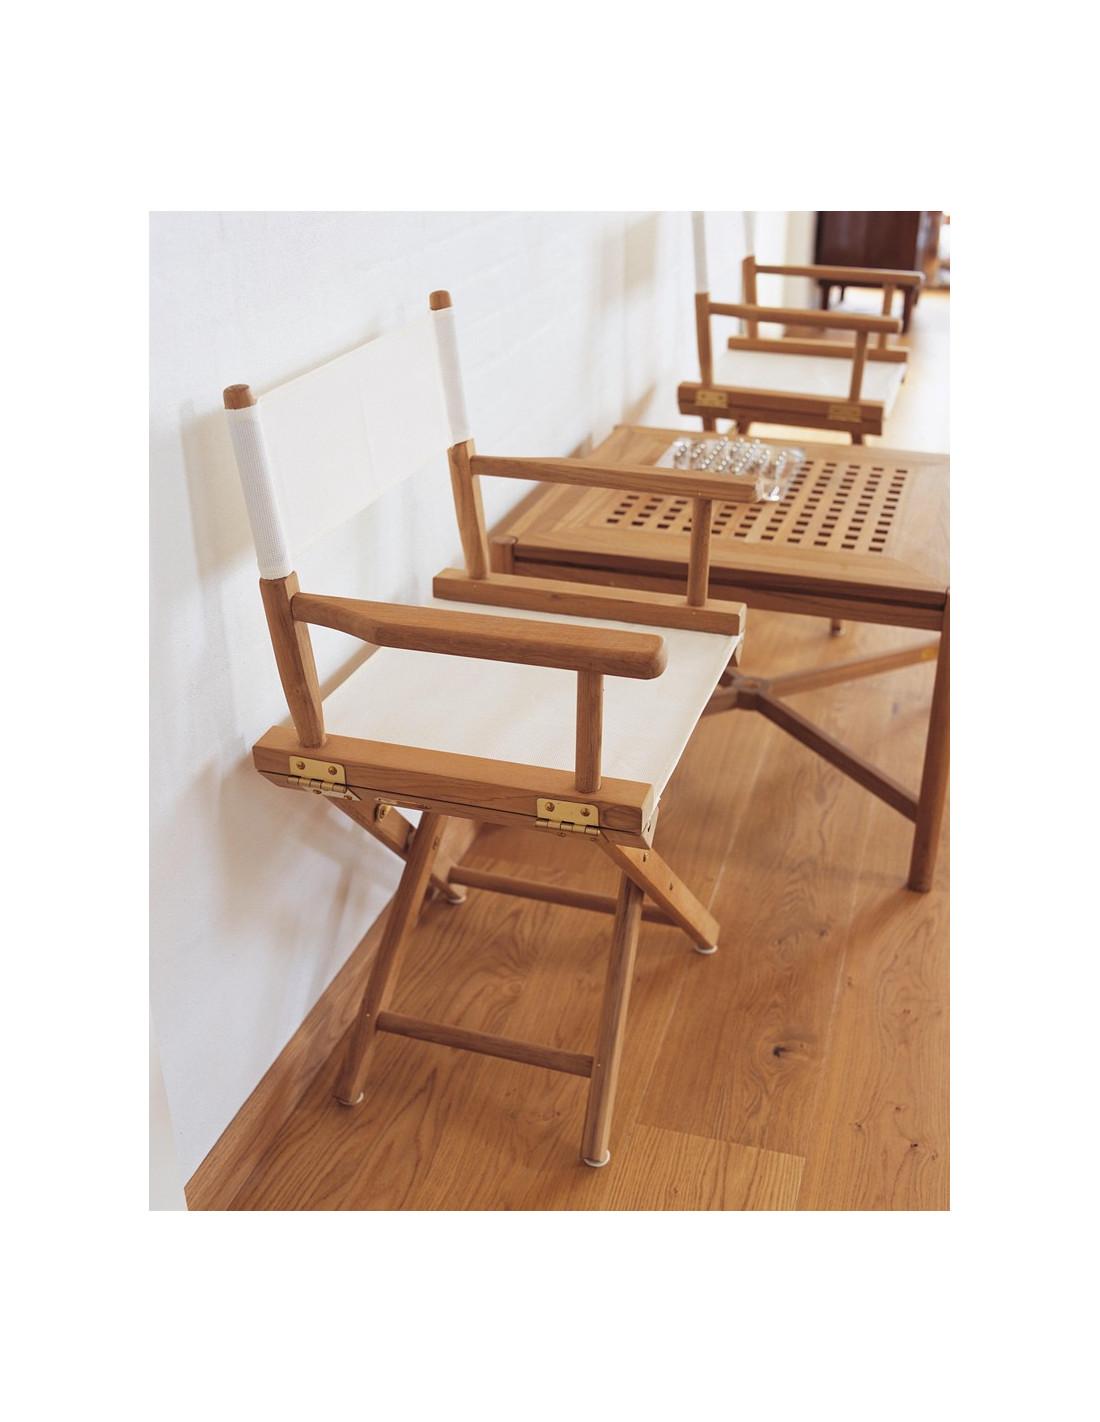 chaise studio la boutique danoise. Black Bedroom Furniture Sets. Home Design Ideas